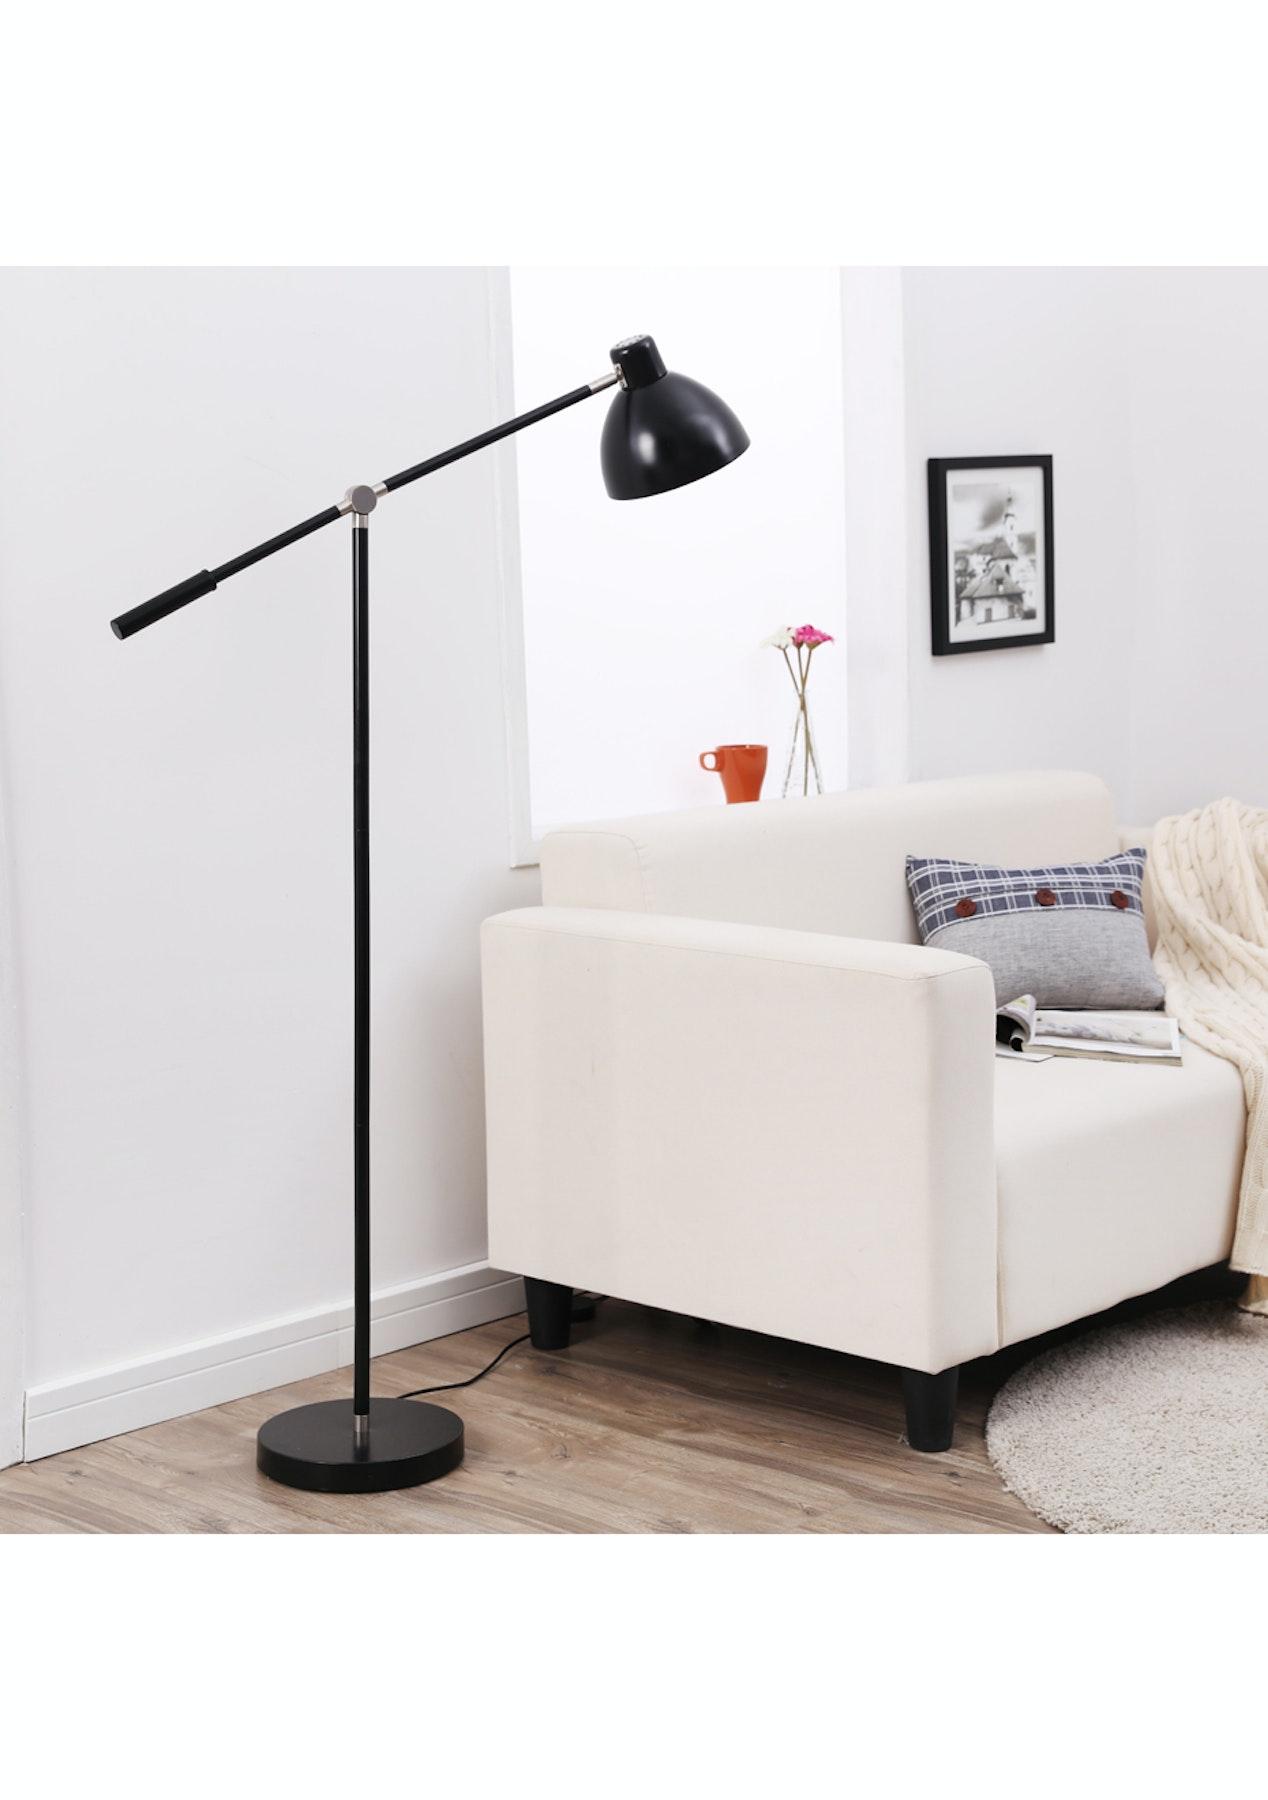 Sherwood Lighting Balance Metal Floor Lamp Black